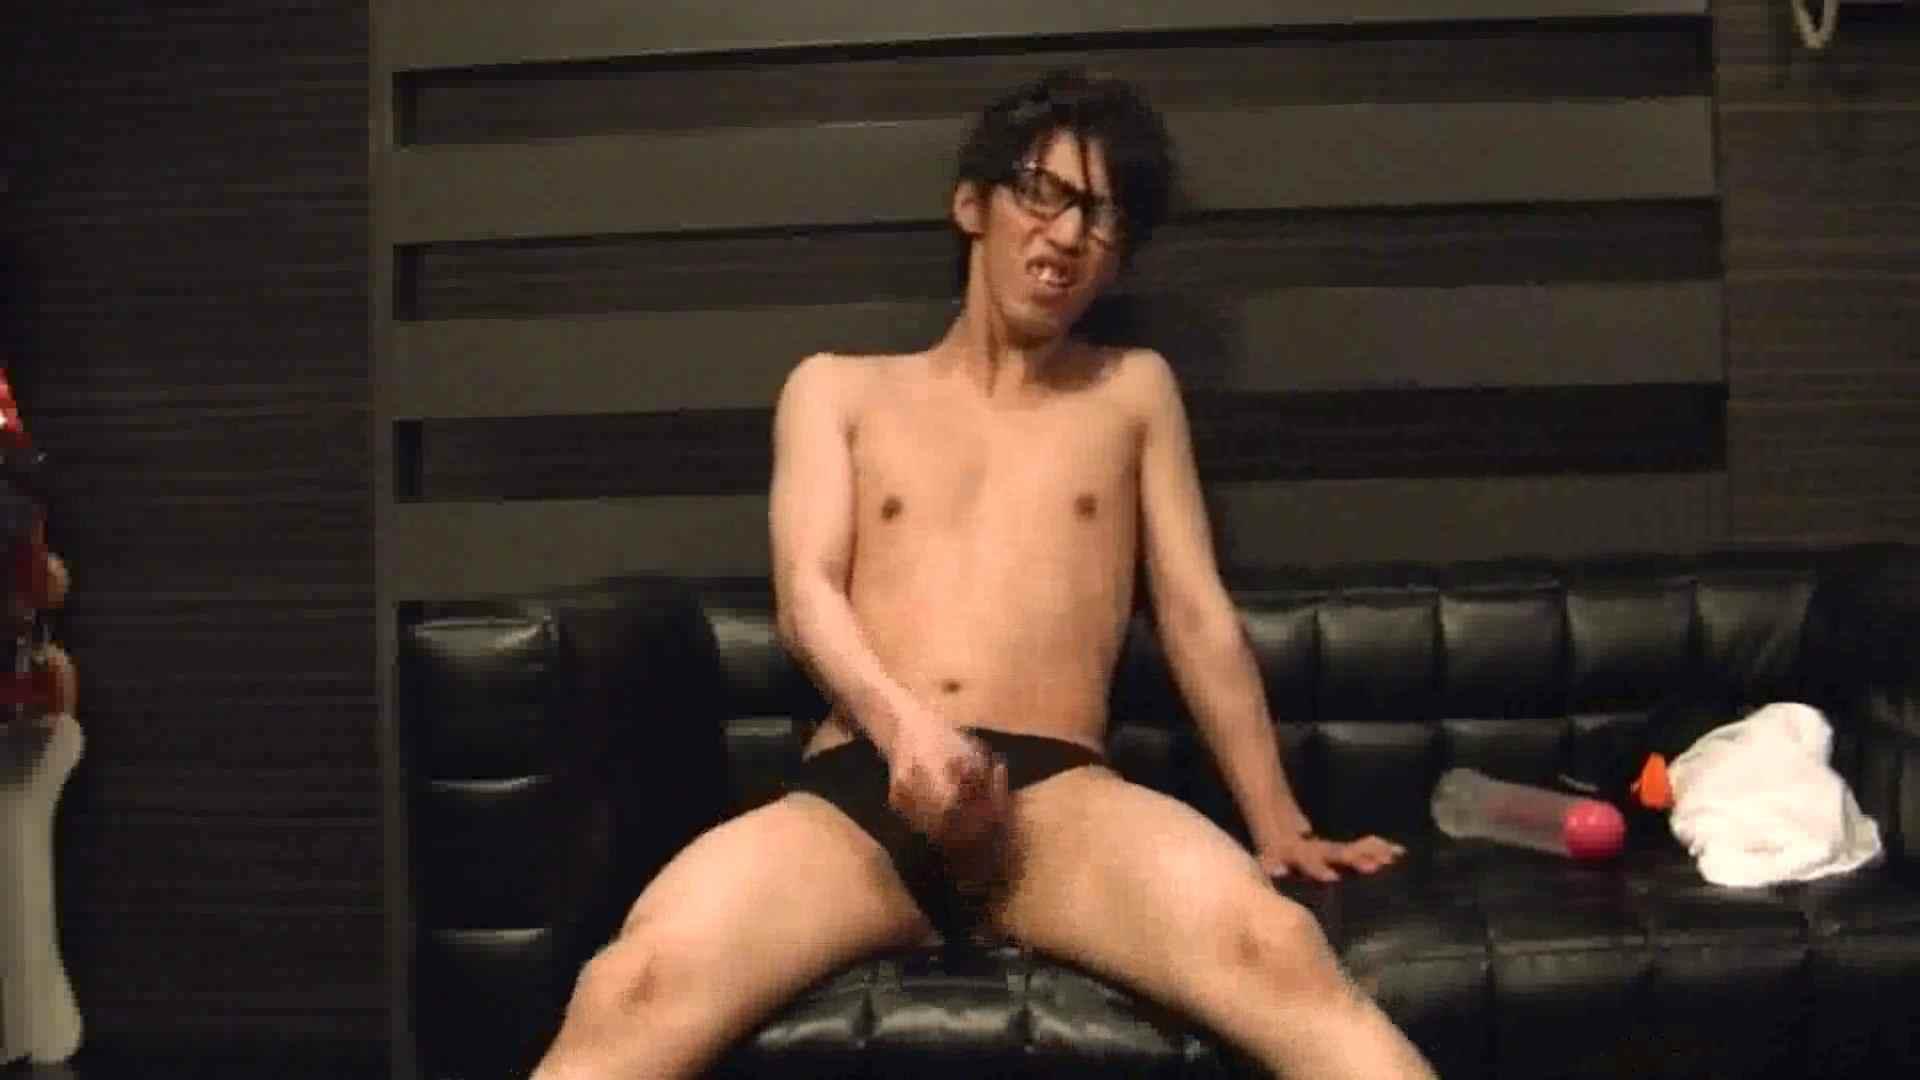 ONA見せカーニバル!! Vol3 男まつり ゲイ無料無修正画像 87枚 13